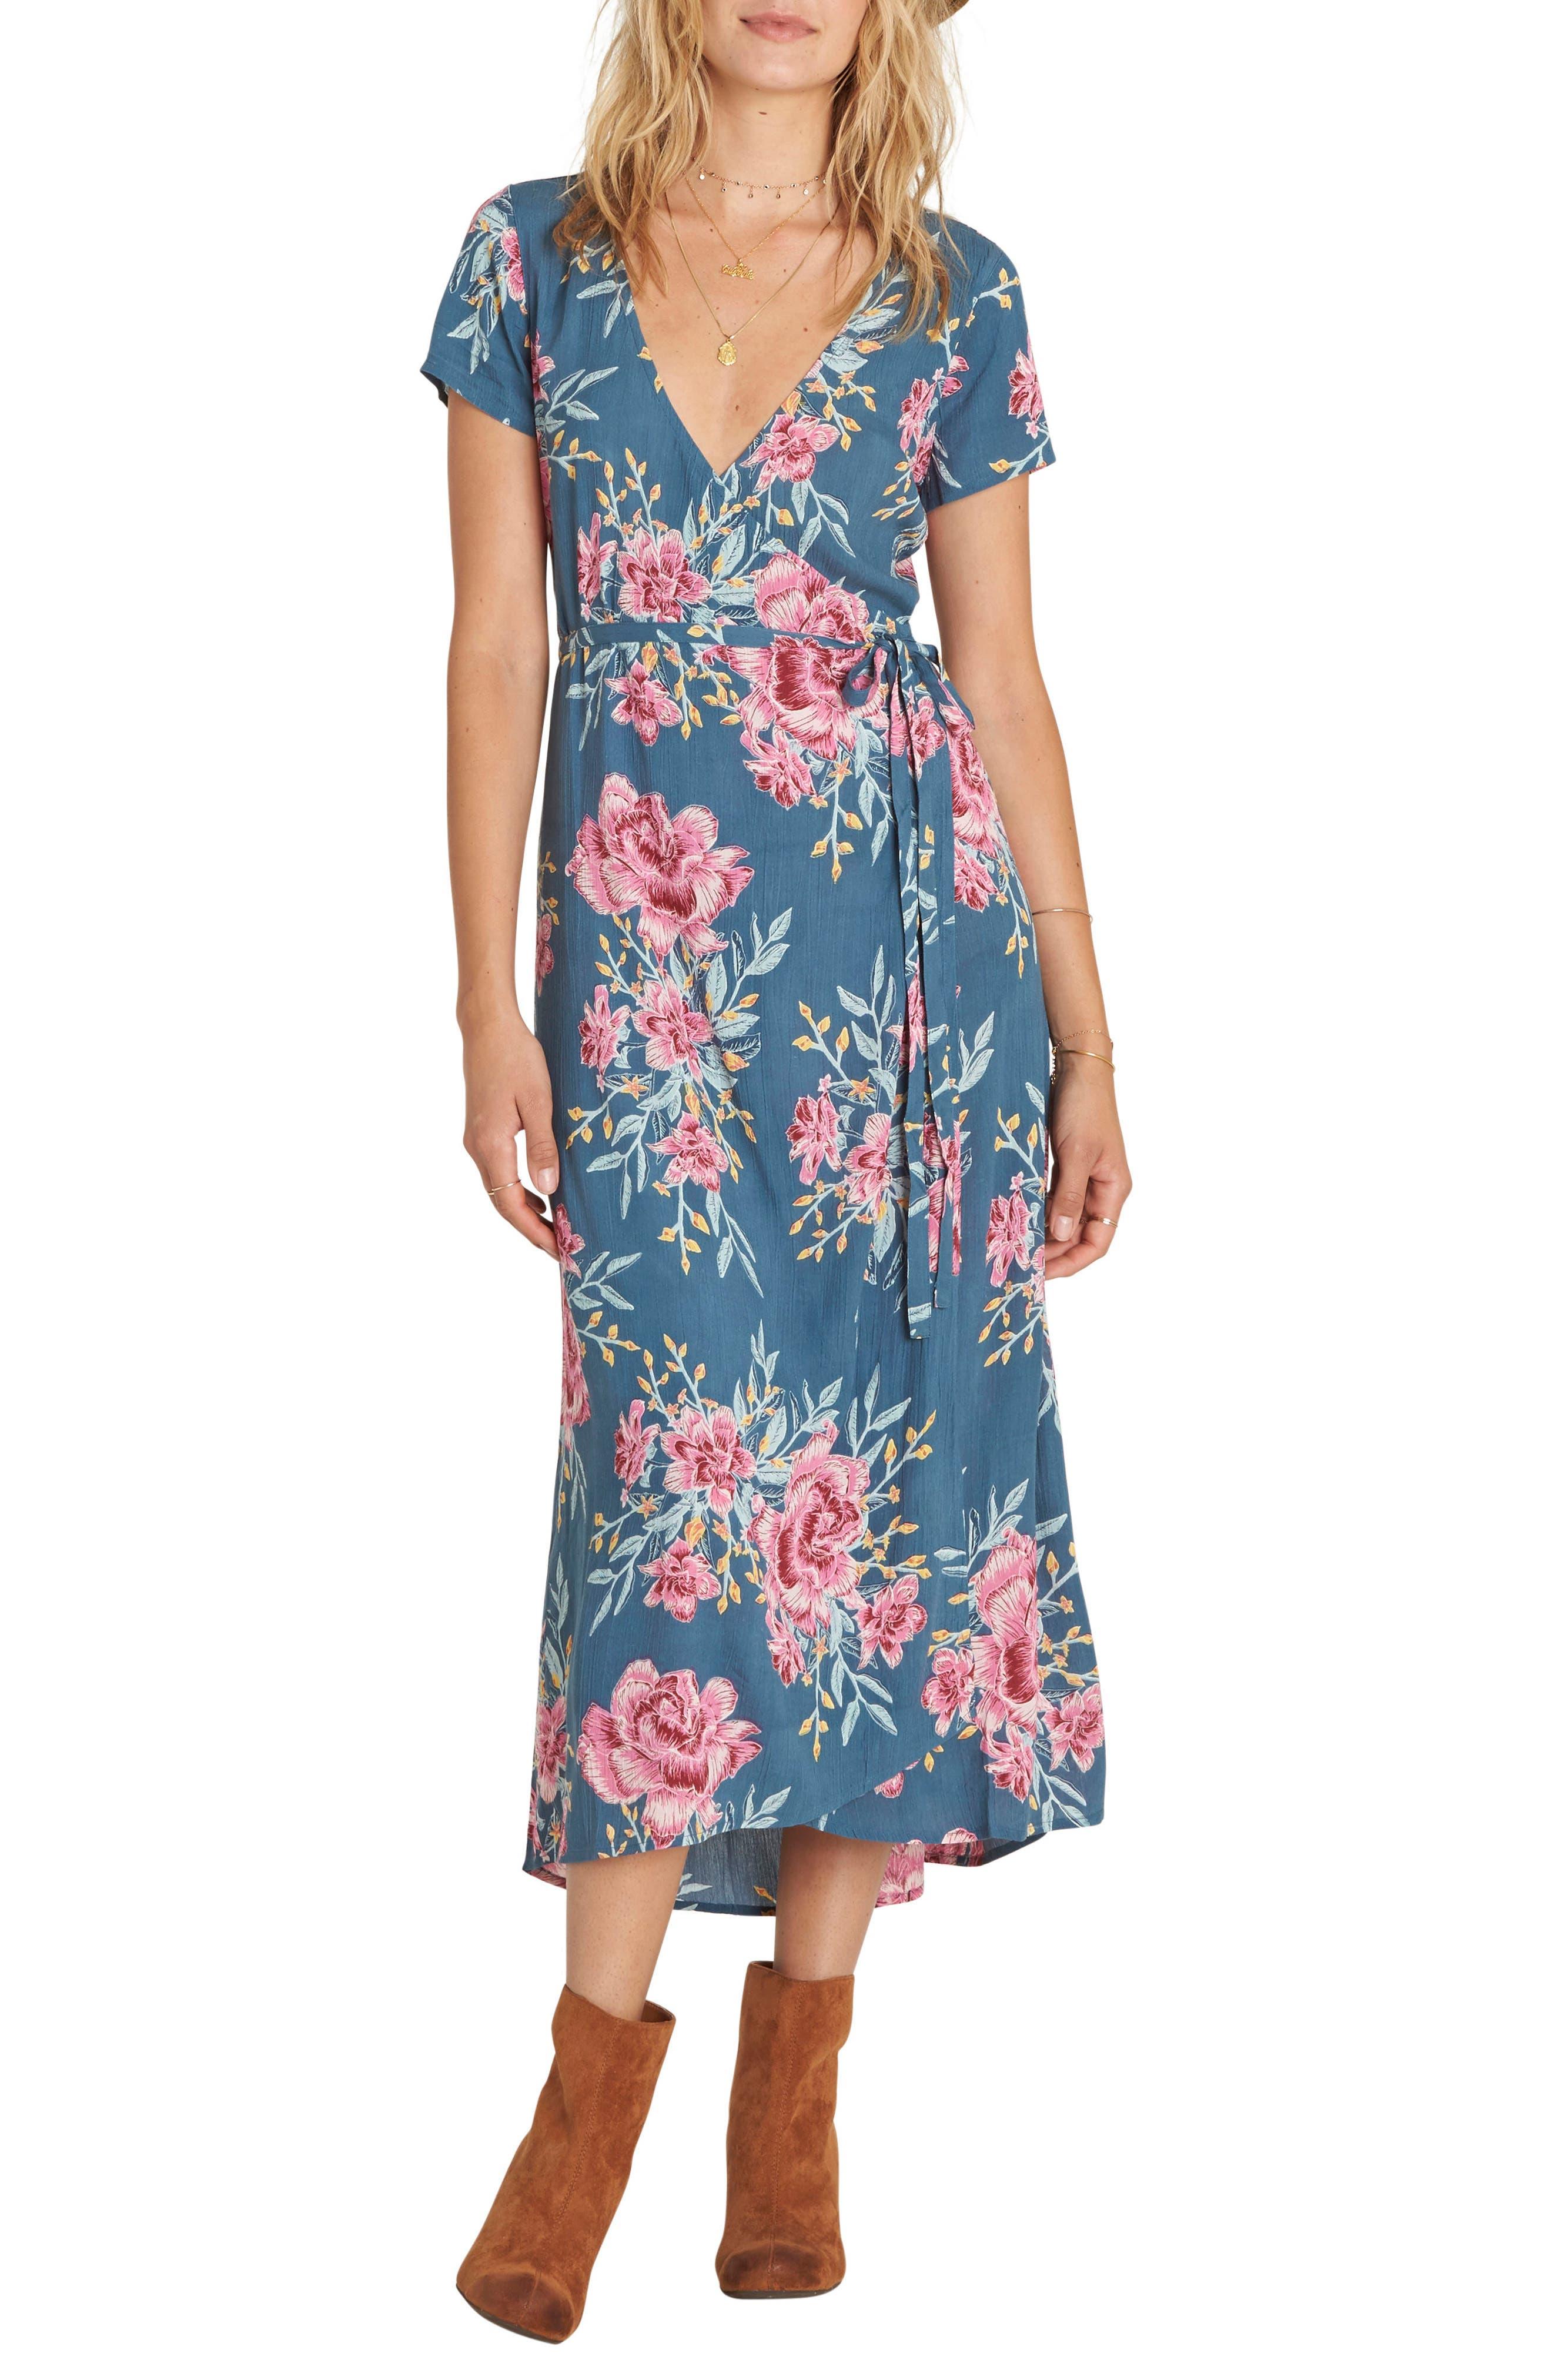 Main Image - Billabong Wrap Me Up Floral Print Wrap Dress